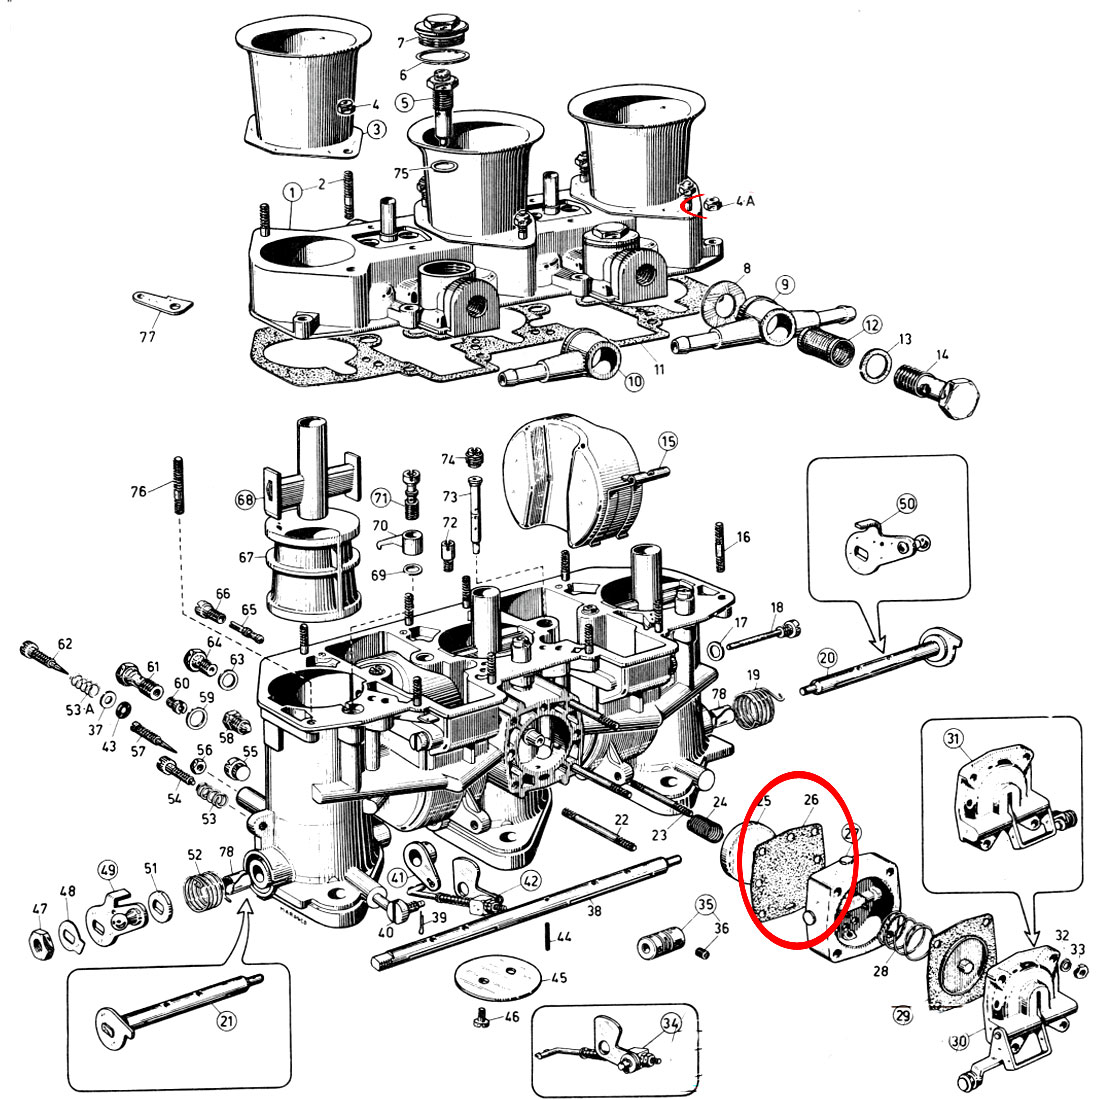 small resolution of ford motorcraft carburetors imageresizertool com ford 2100 carburetor vacuum diagram motorcraft 2100 carburetor diagram